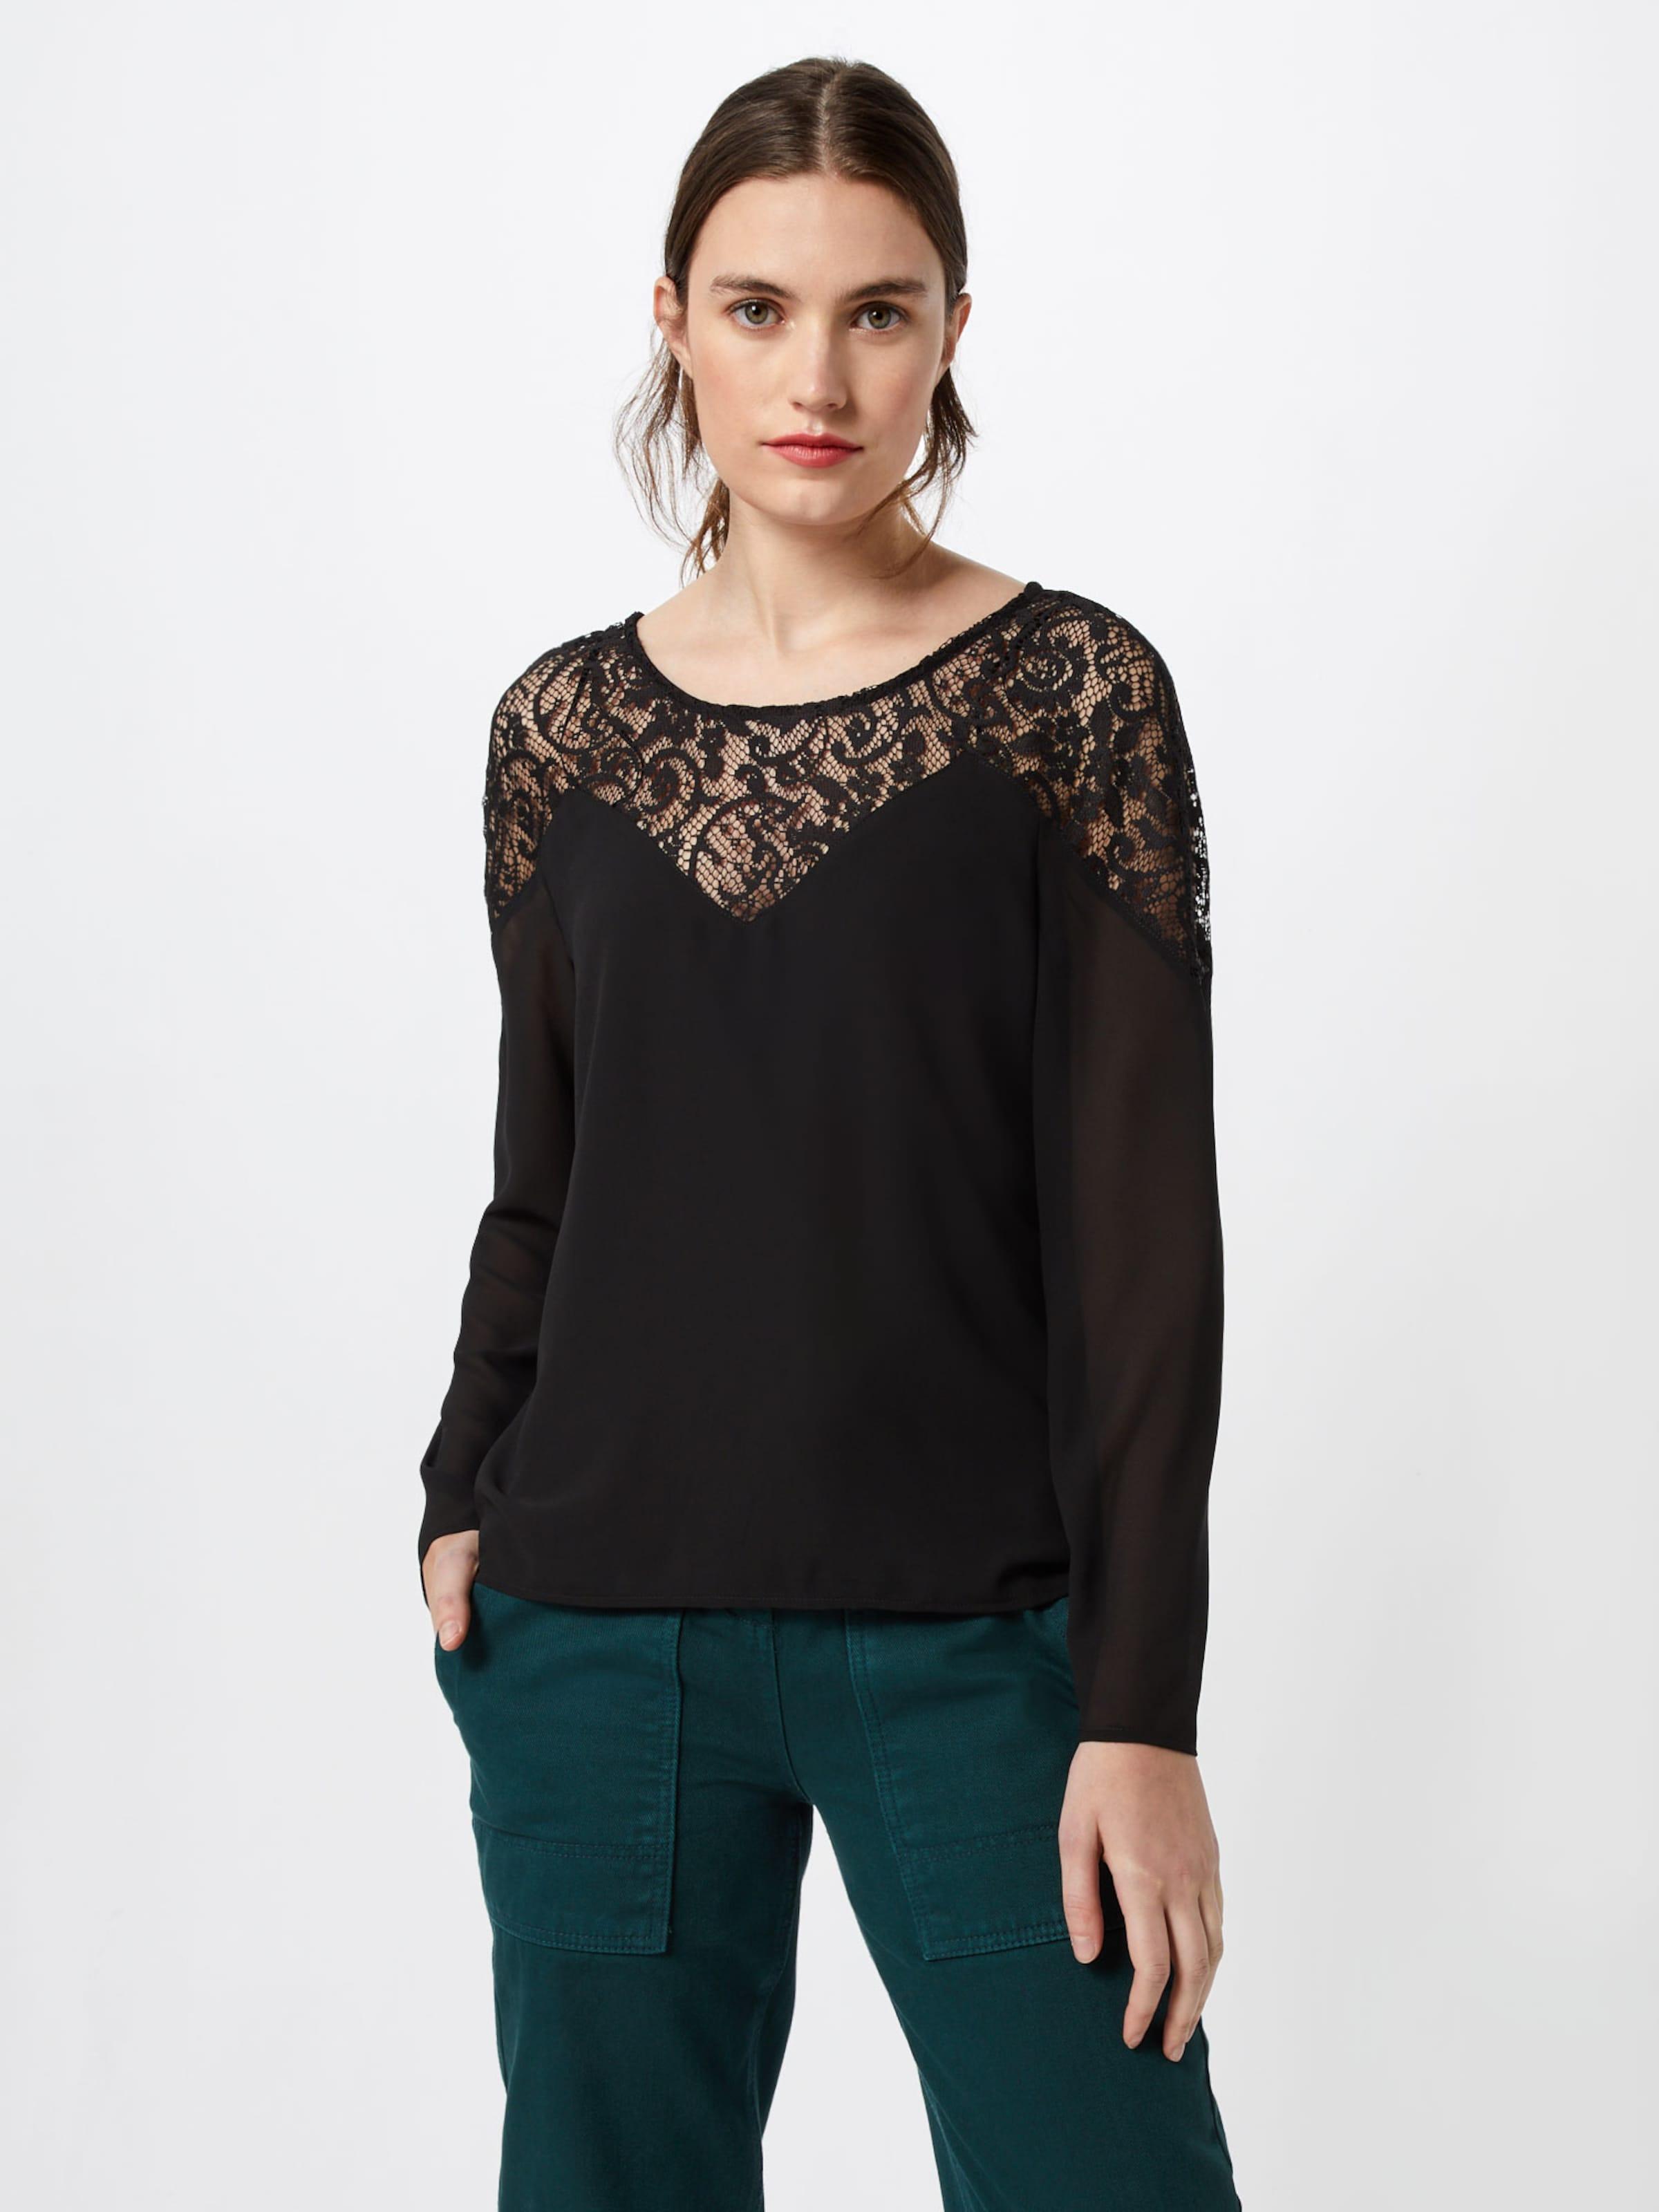 Vila Top' Schwarz Lace L s Shirt 'vibekida In dCsxhtQrB